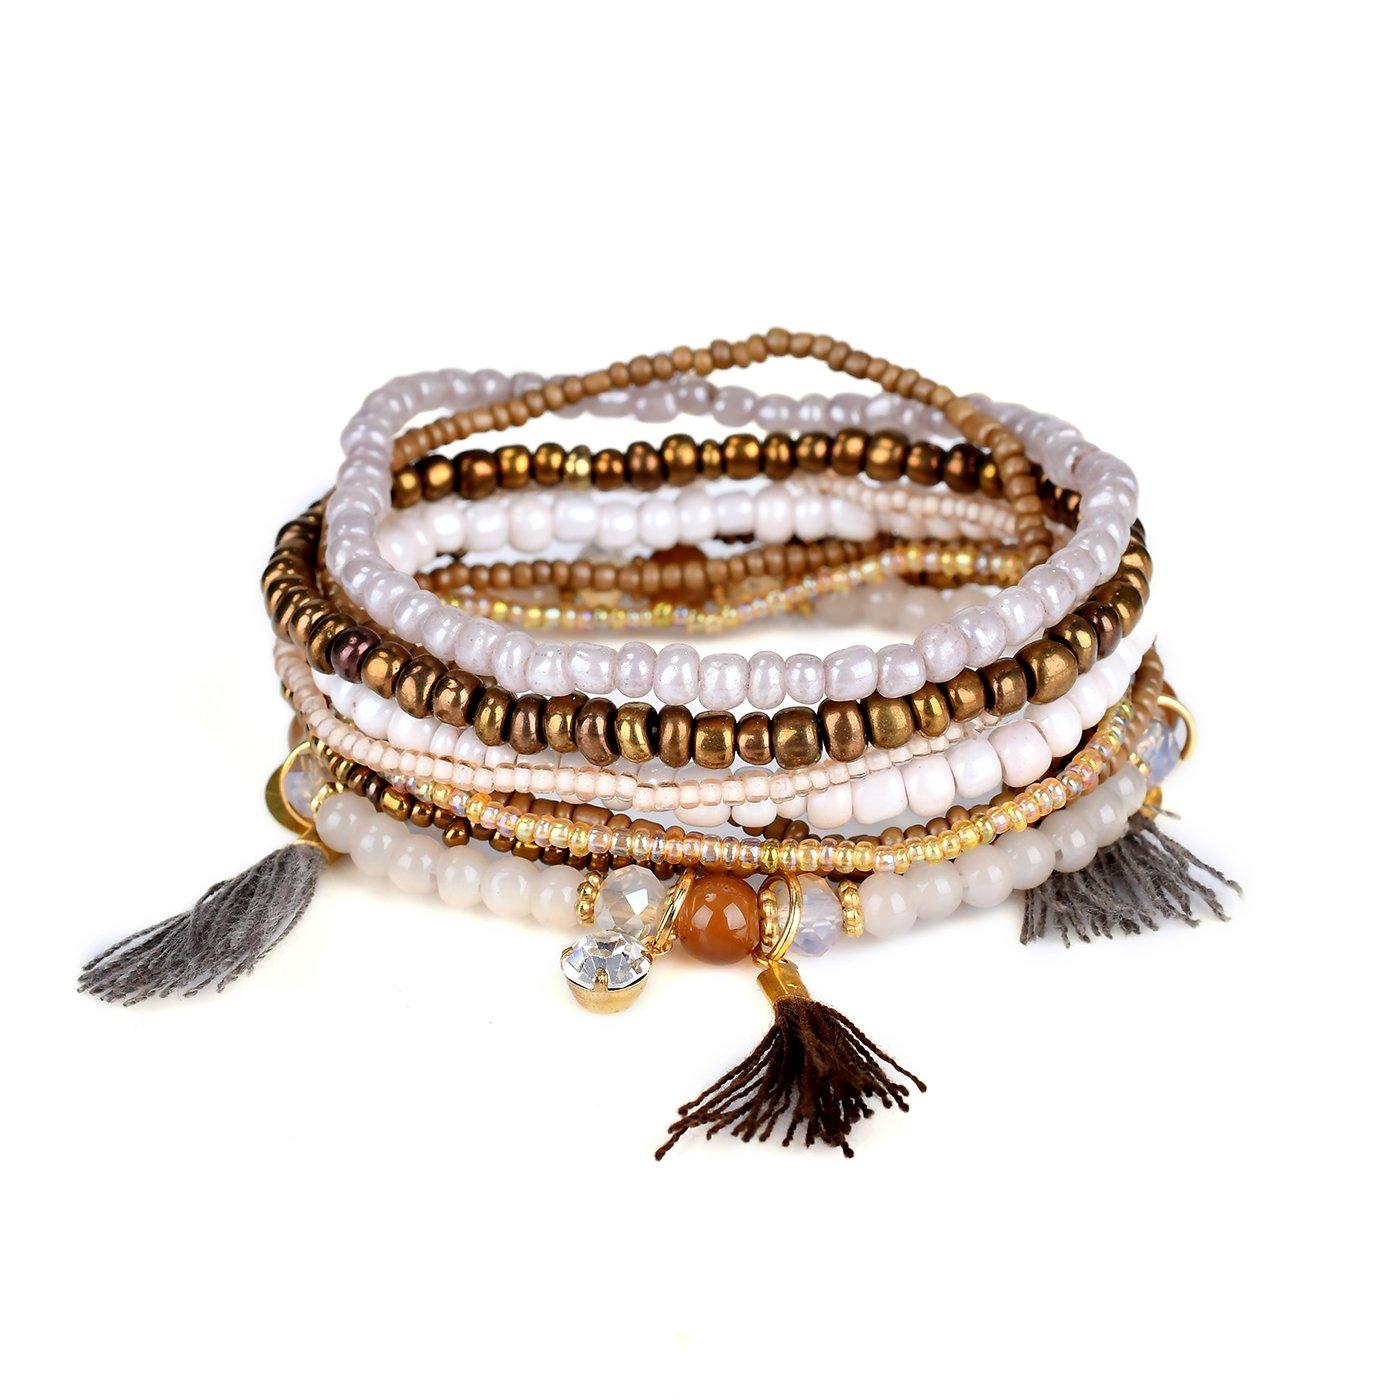 Teniu Girls Fashion Bead Bracelet Charm Bohemian Bracelet Vitality Layered Stretch Bracelets for Women Girls Jewelry BONFASH 602693116206